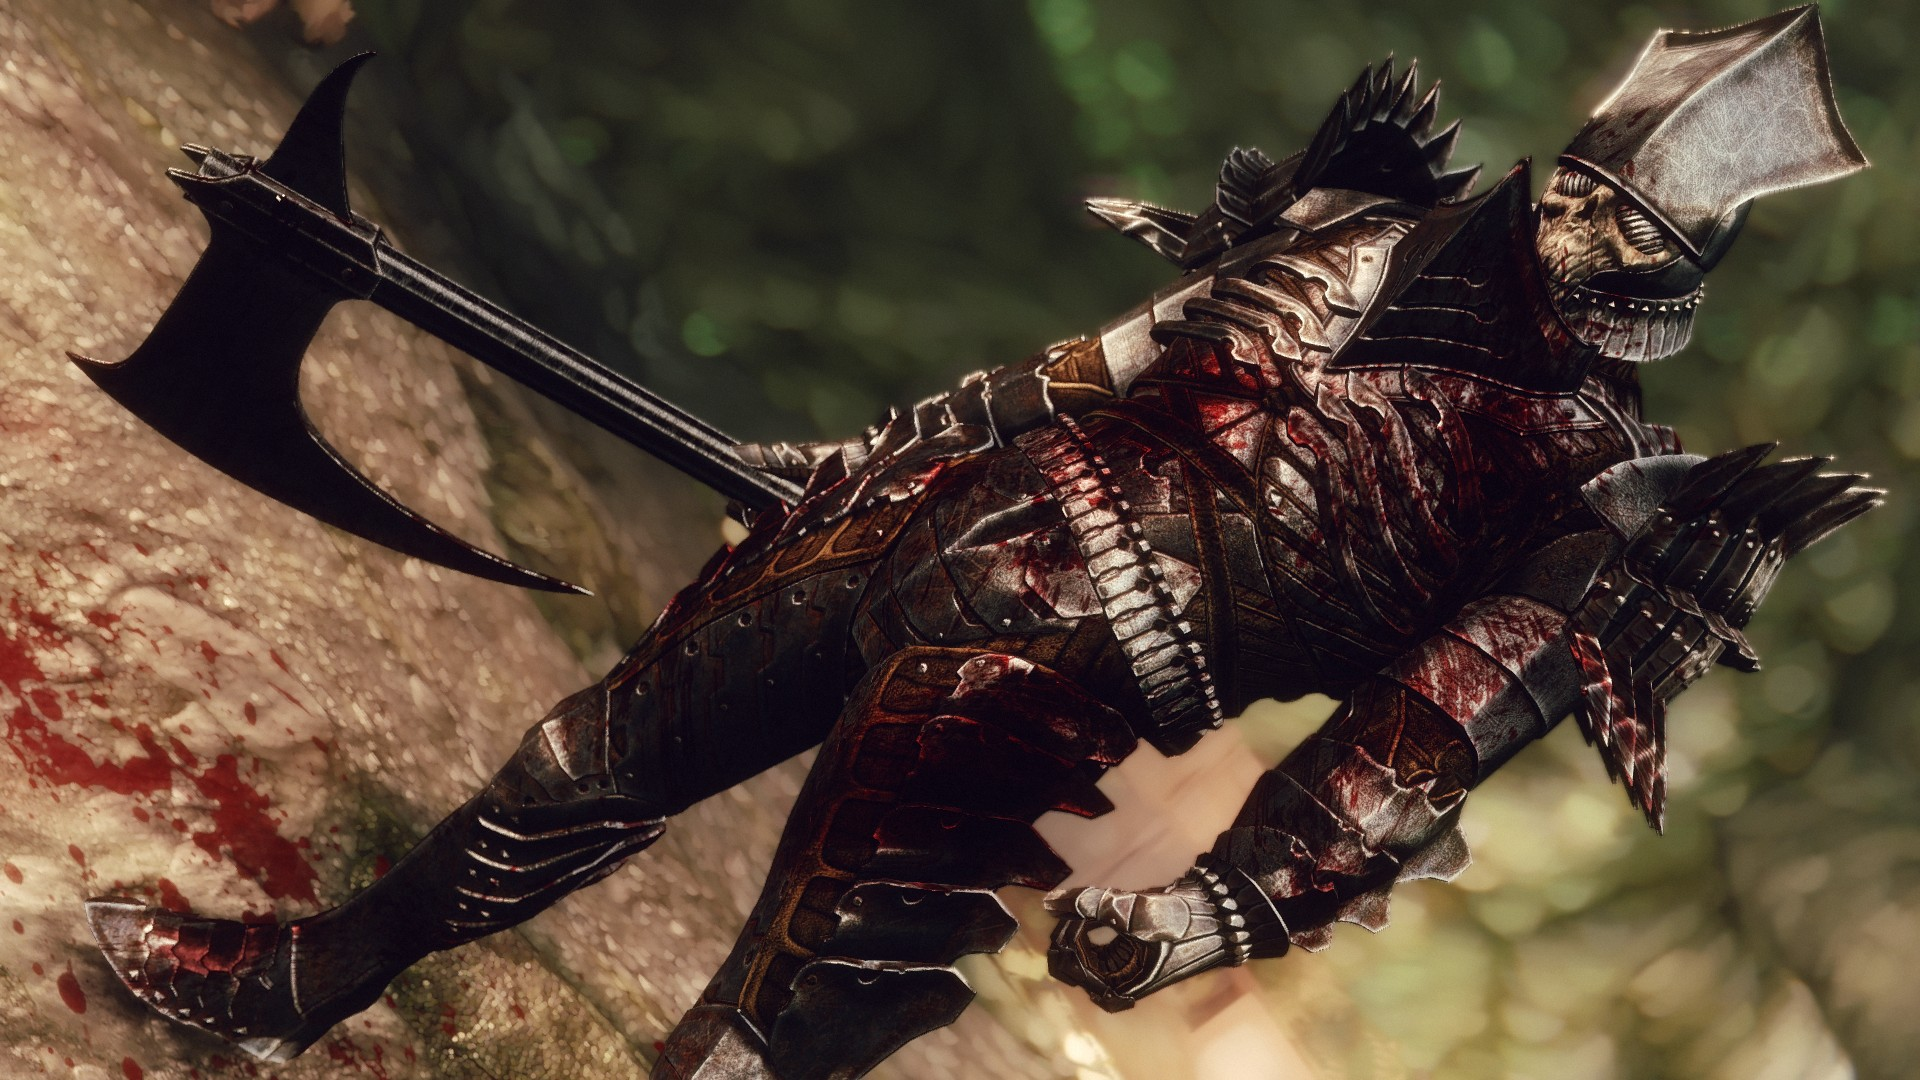 Team TAL - The Elder Scrolls 5: Skyrim